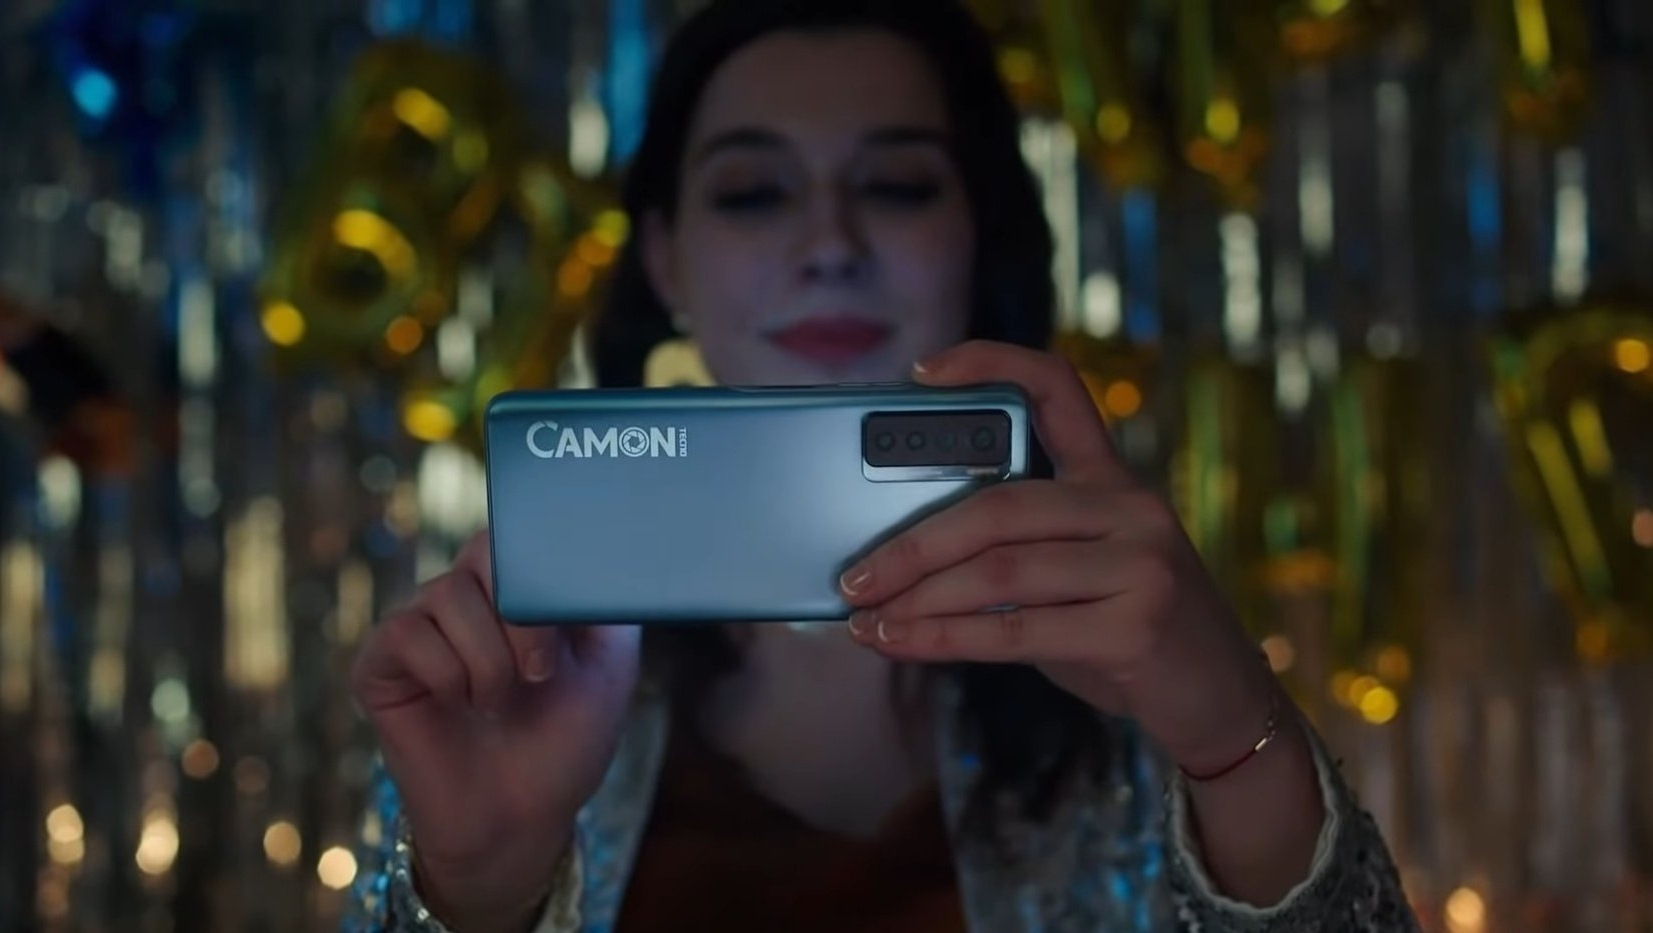 Win big: Tecno gives consumers reasons to celebrate Camon 17P arrival in SA - NOWinSA